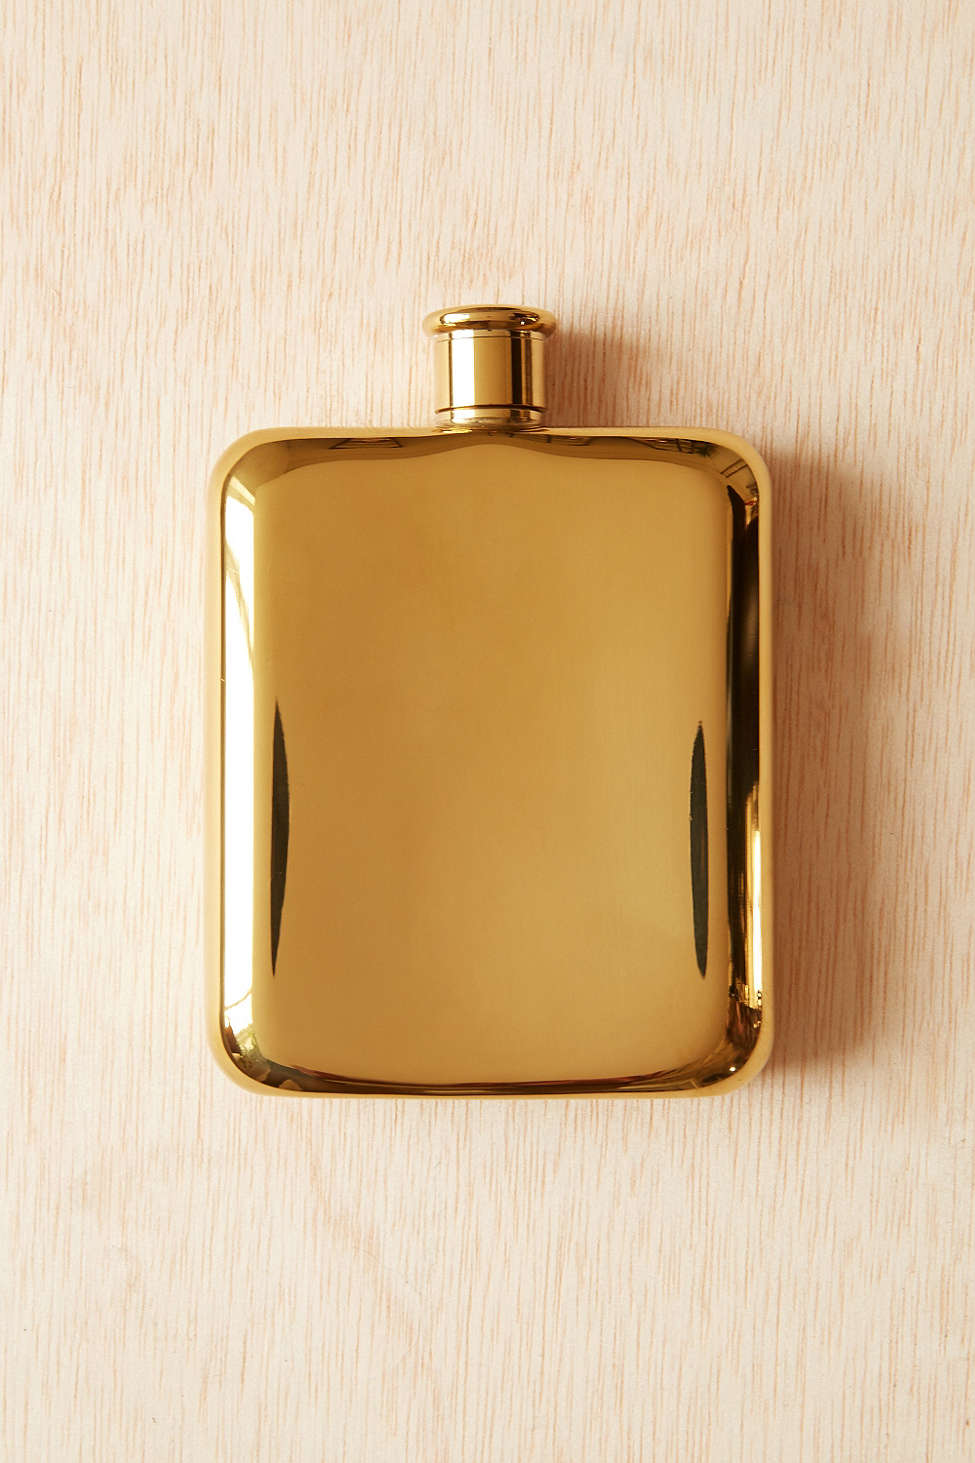 GoldPlatedFlask.jpg